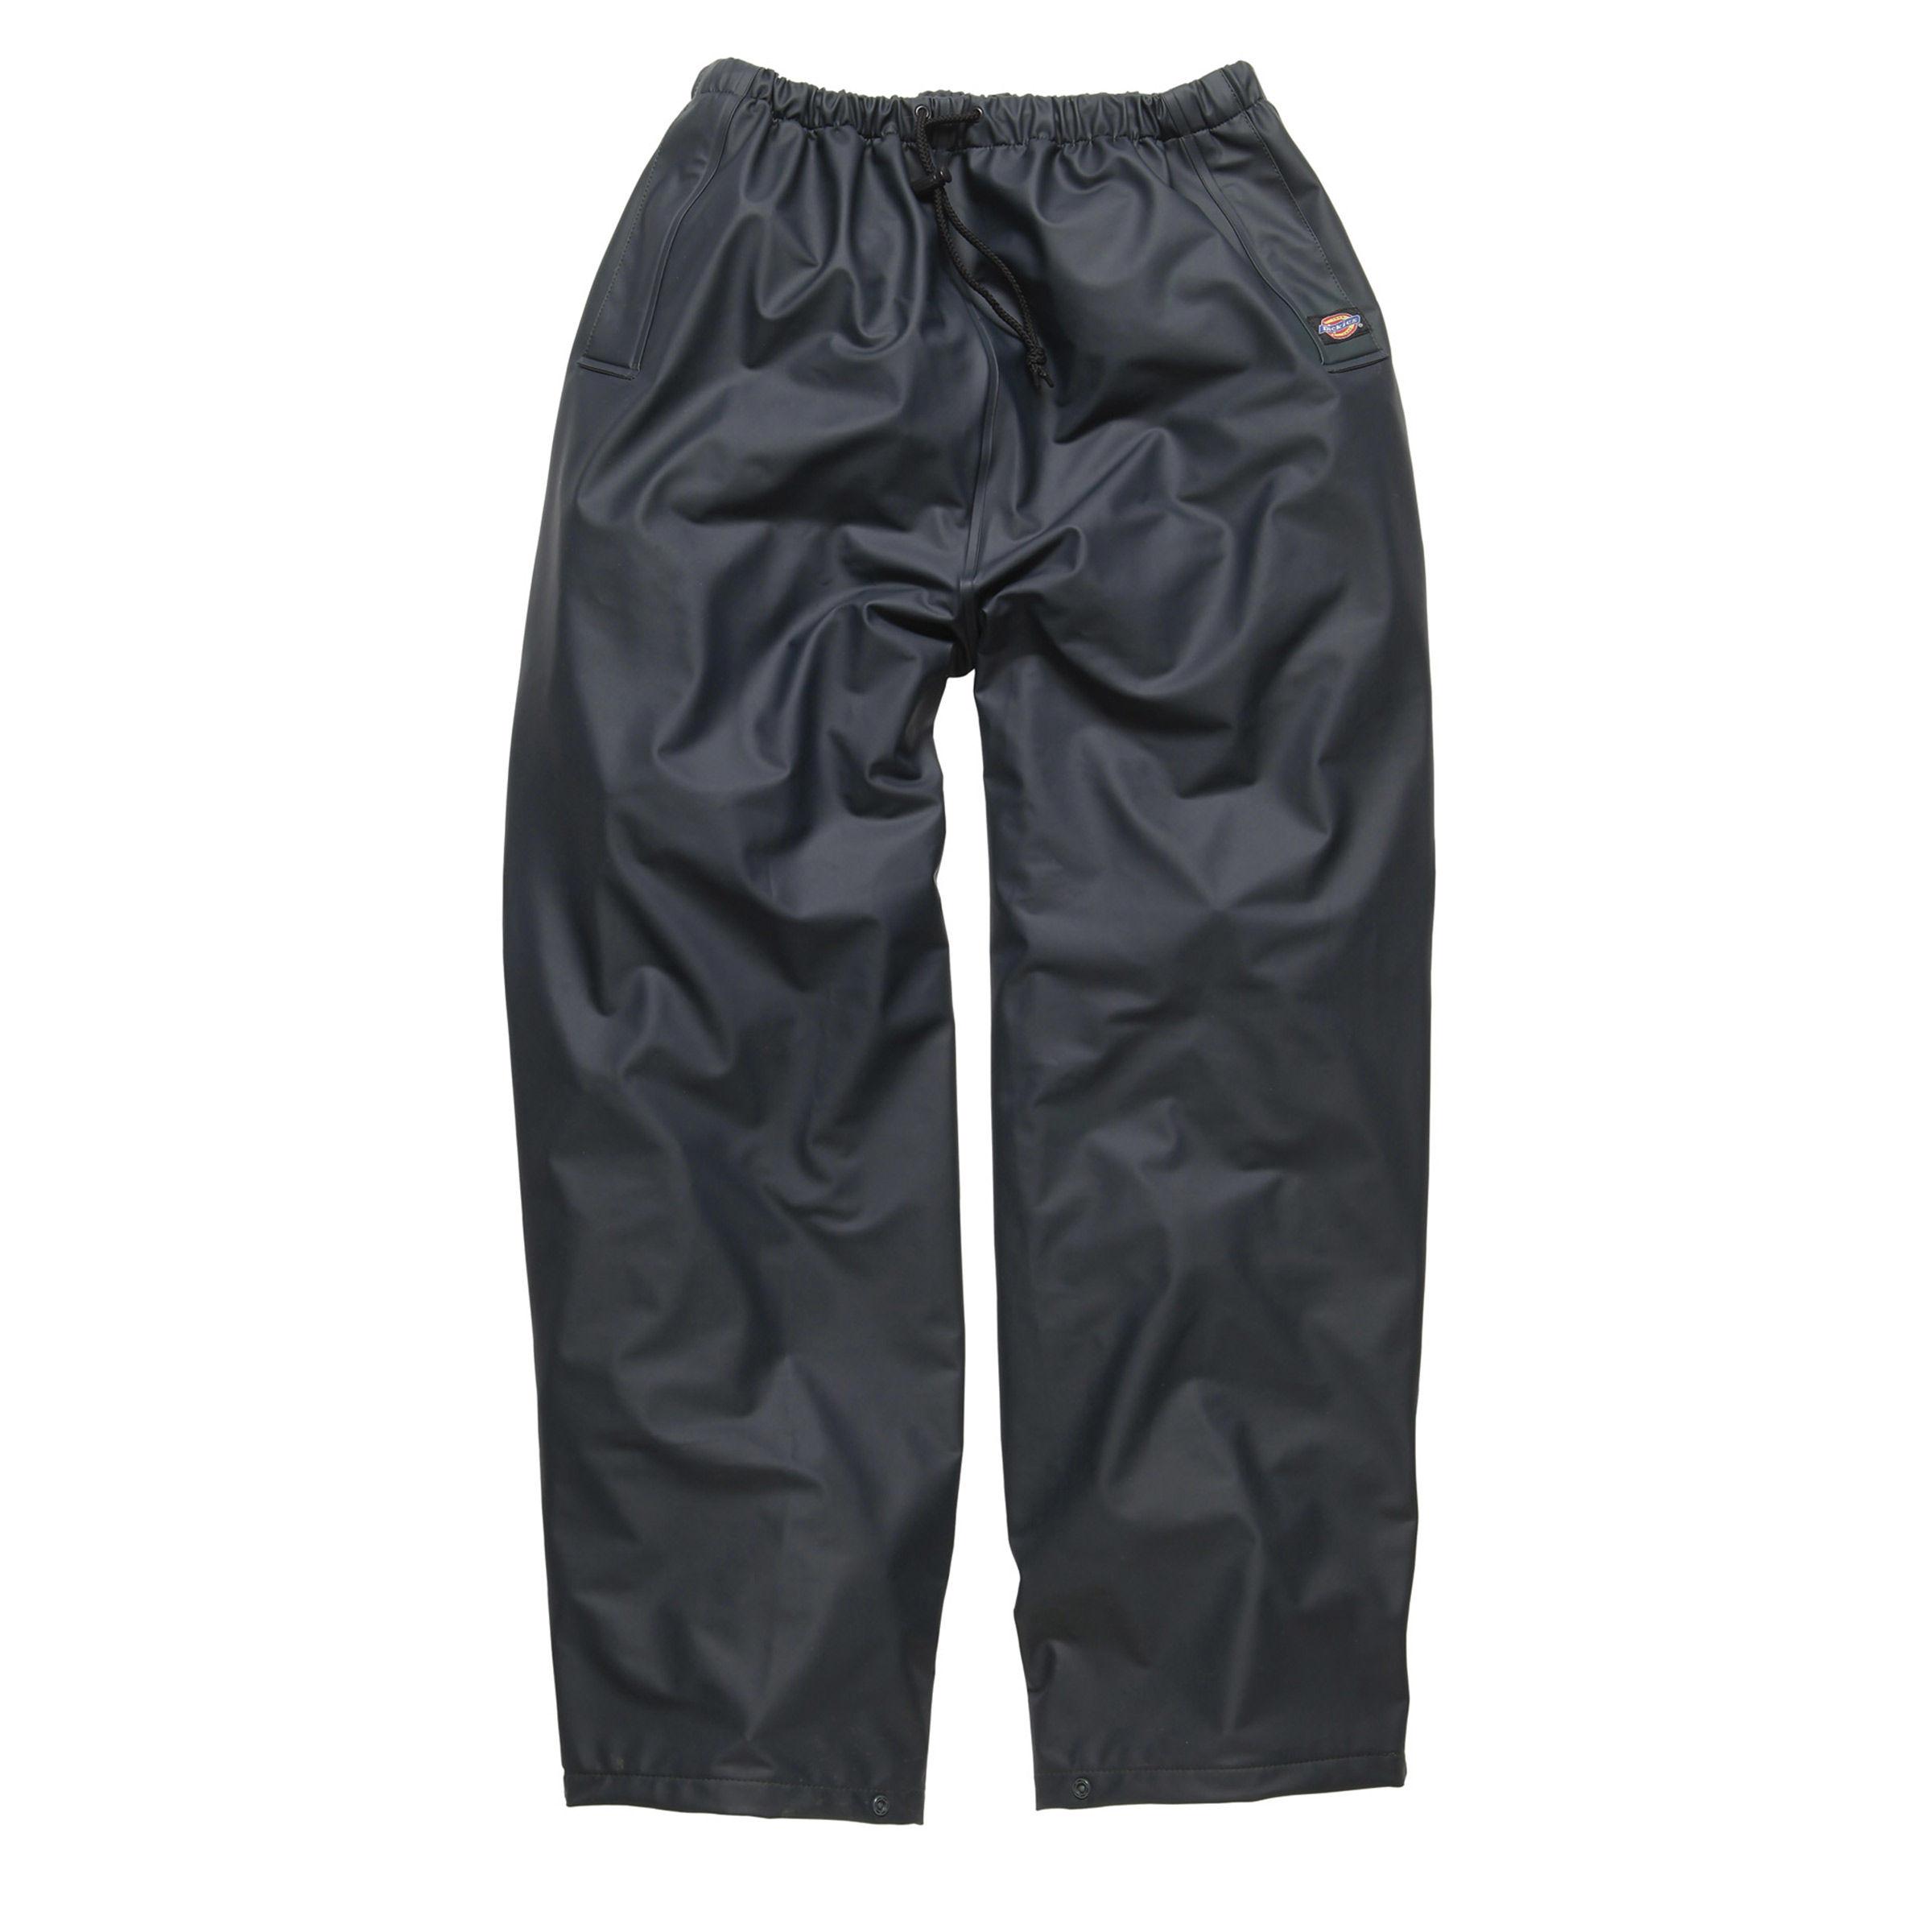 cheap price best selection of 2019 famous designer brand Dickies WP51000 Raintite Waterproof Trousers (Navy) - XXXL